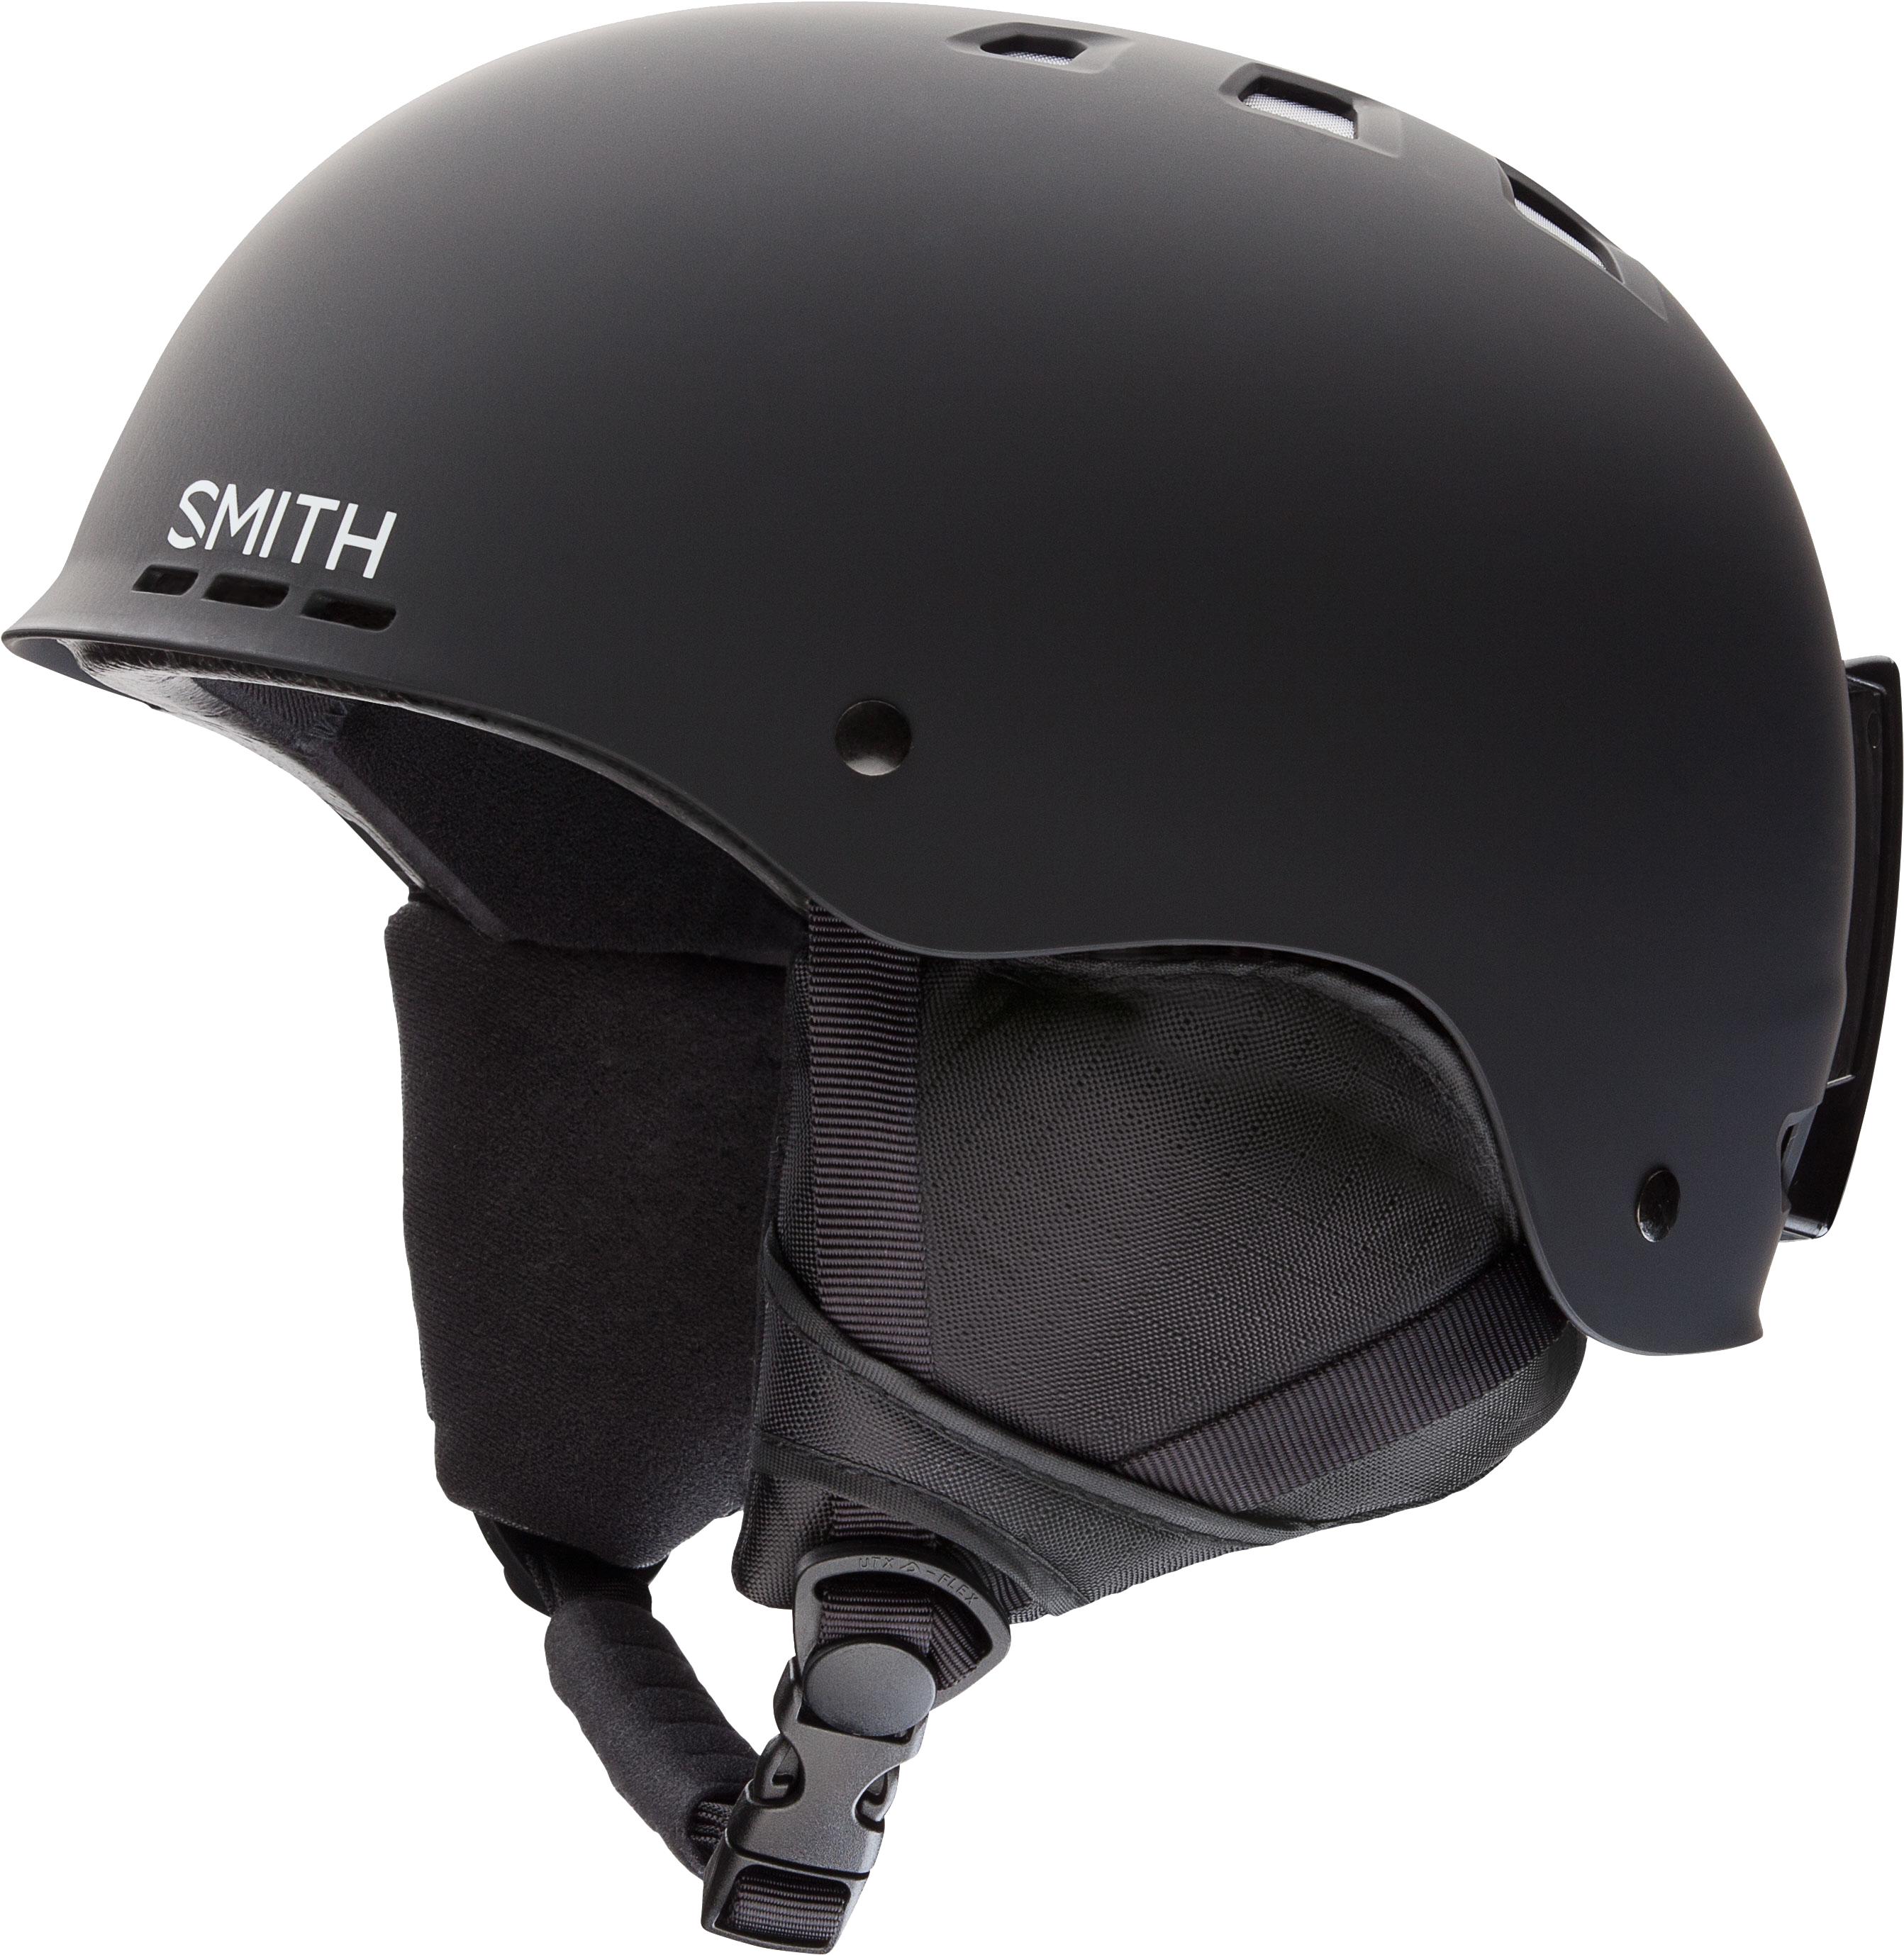 8c1c592bdb7 Ski and snowboard helmets